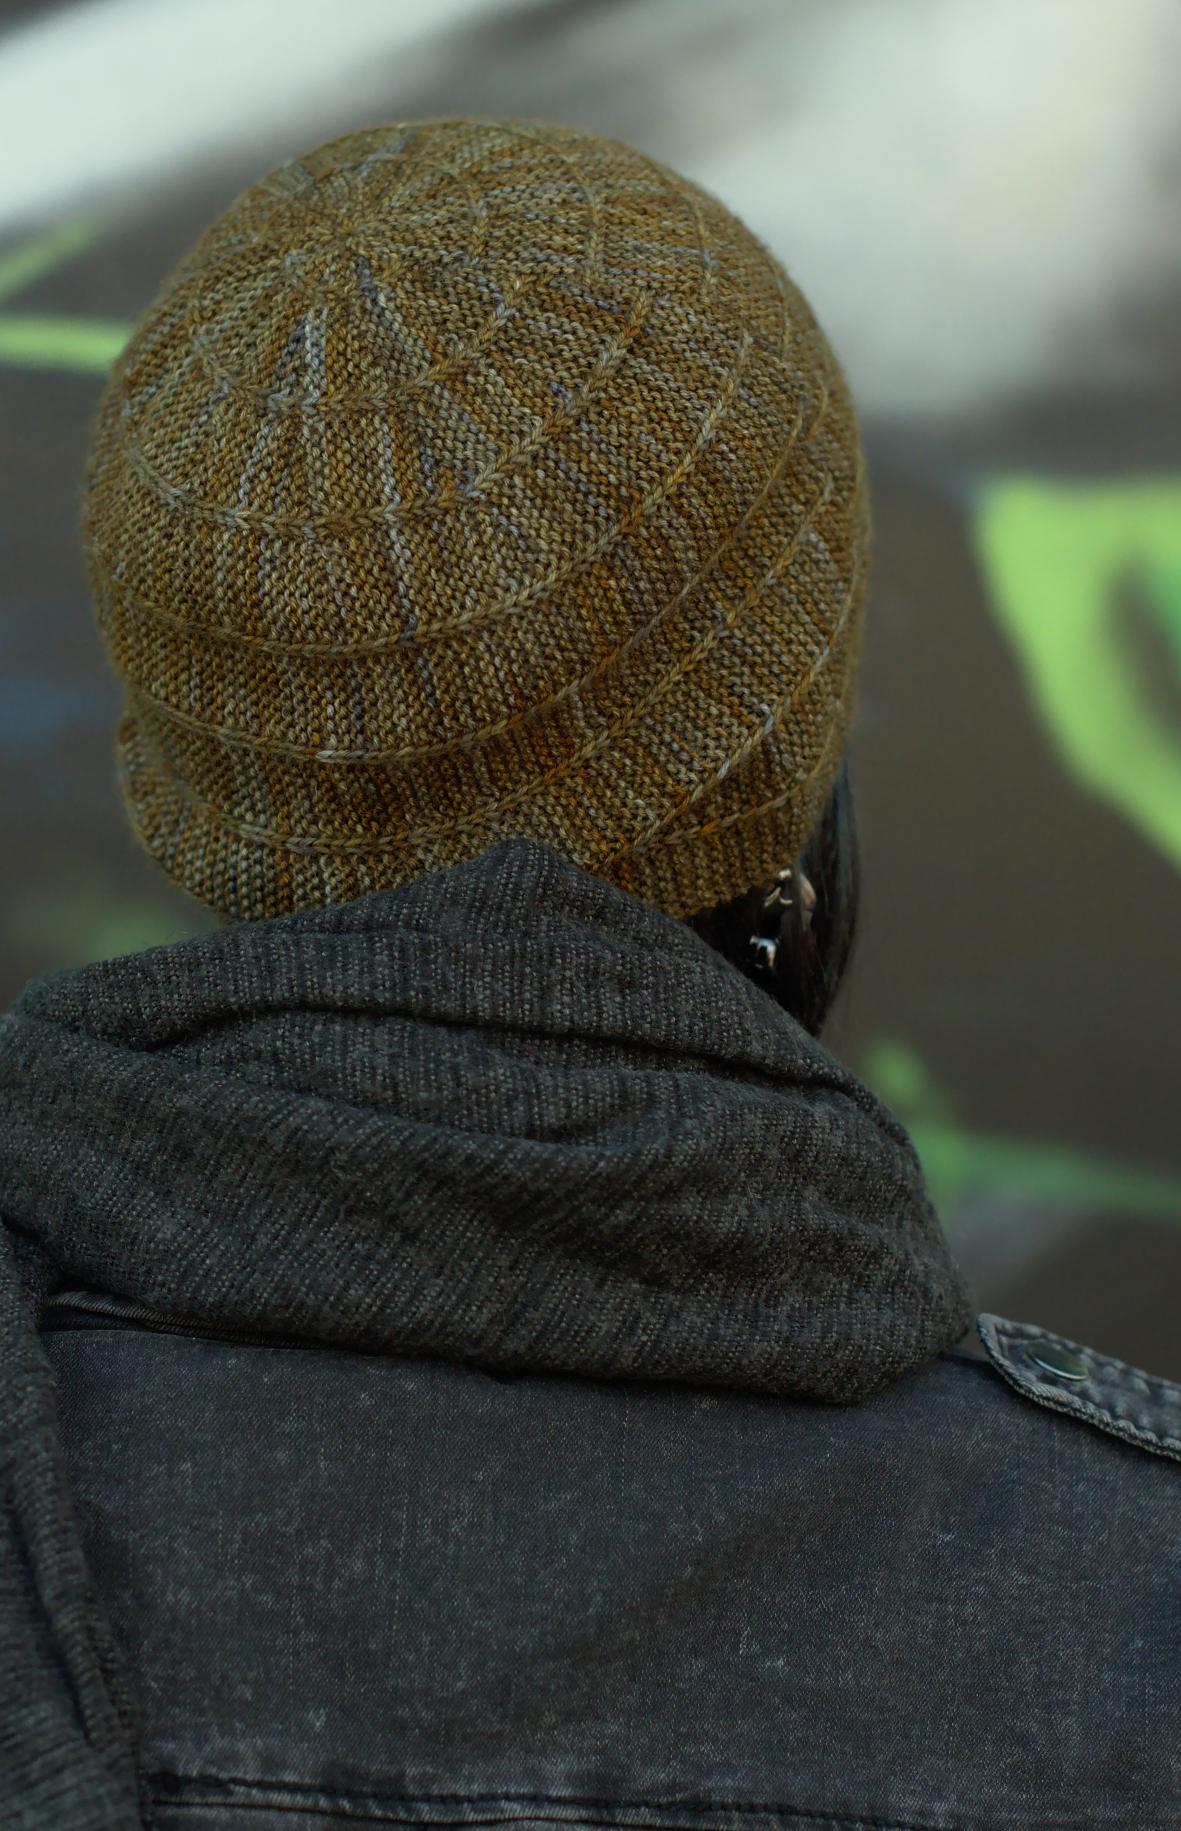 Circled 3 sideways knit Hat knitting pattern featuring negative semi circles